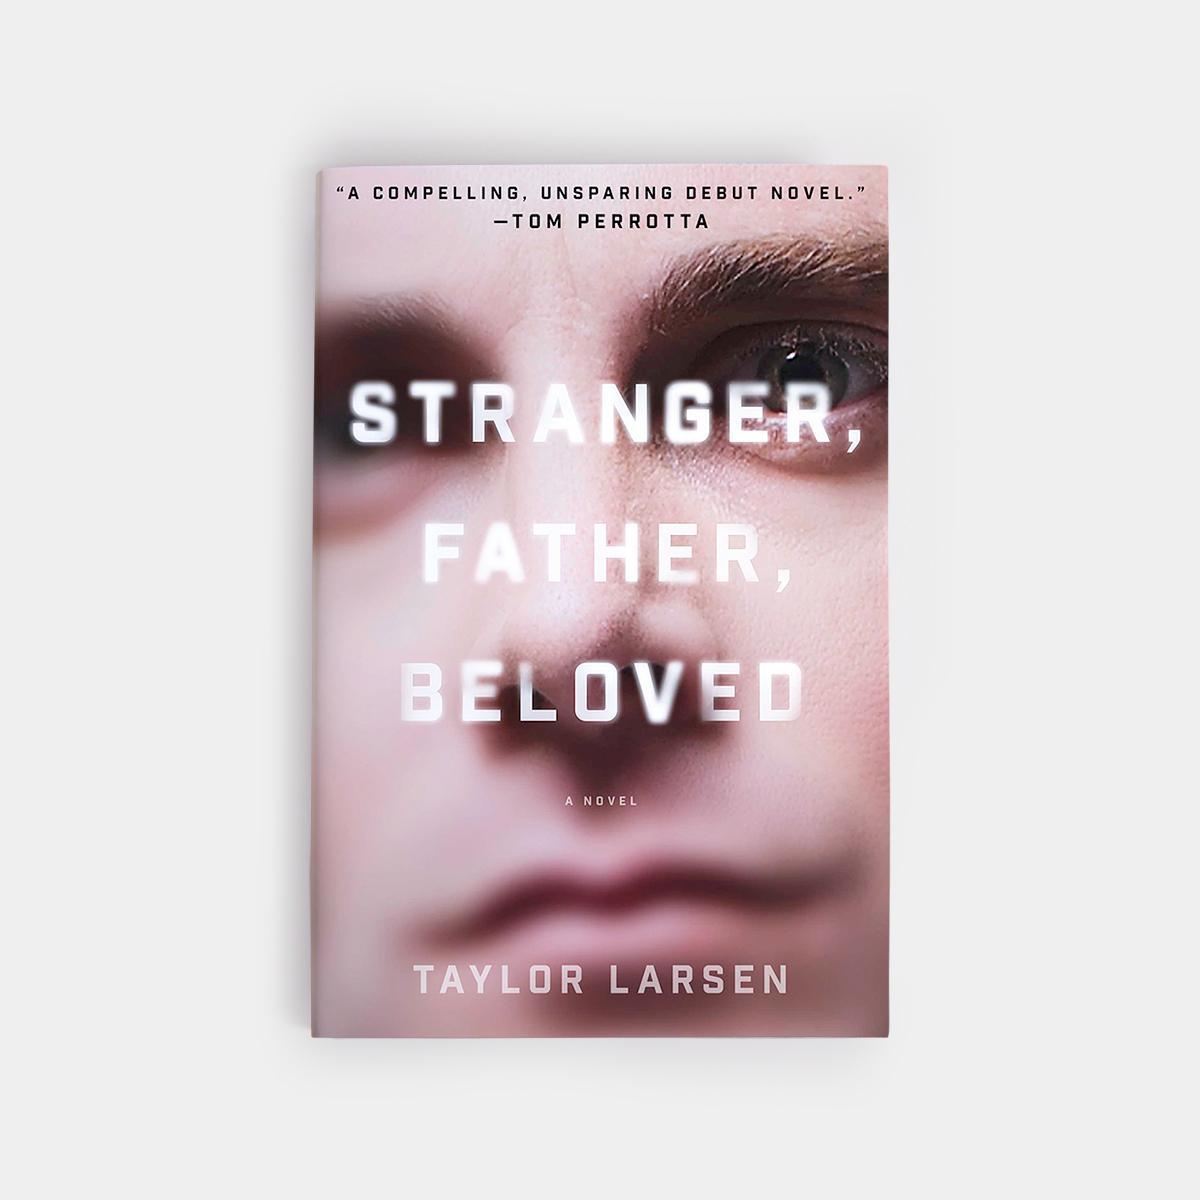 Stranger, Father, Beloved - annadorfman.com